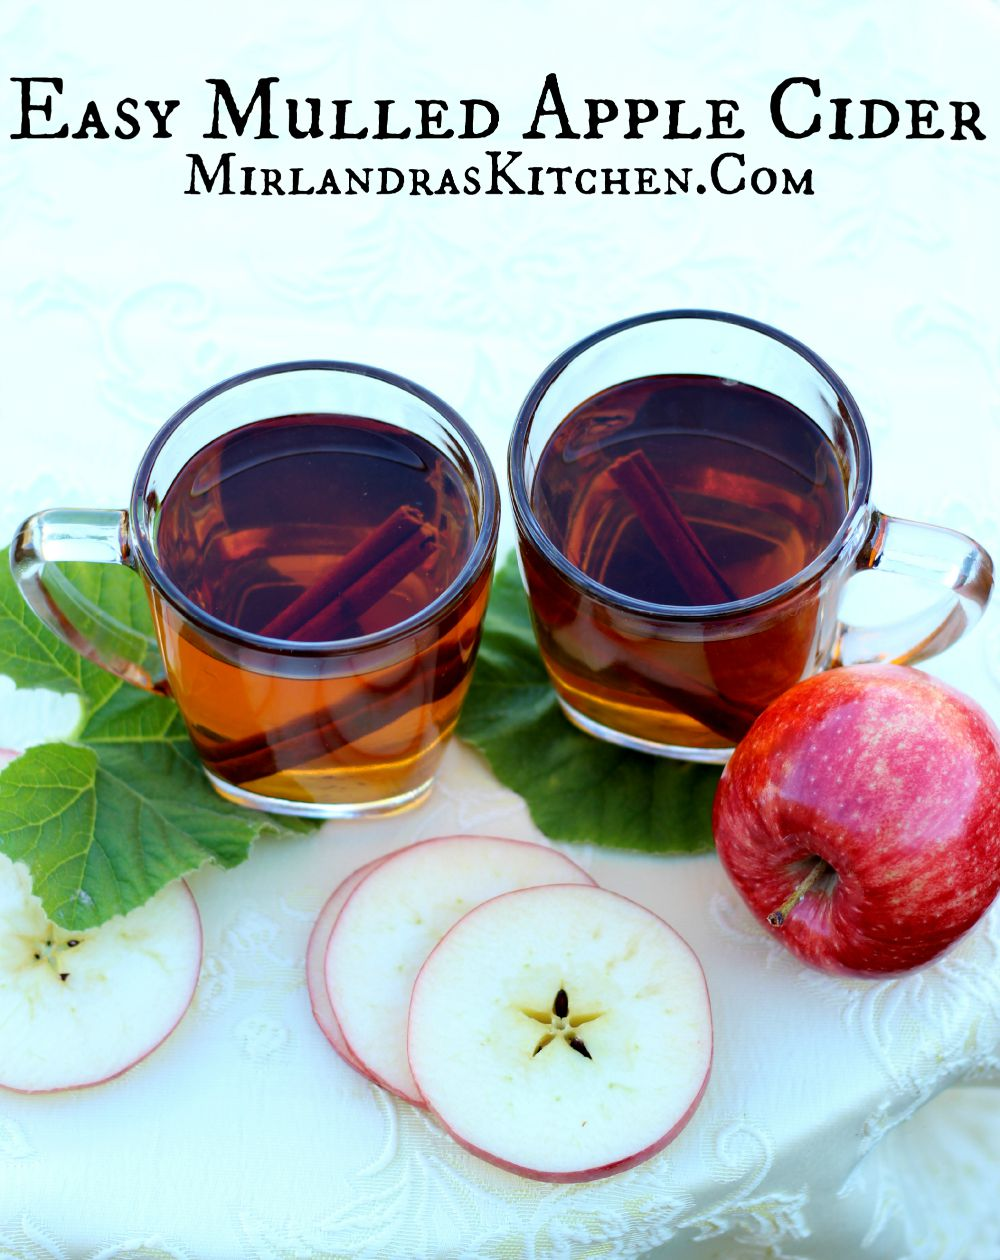 Easy Mulled Apple Cider - Mirlandra's Kitchen